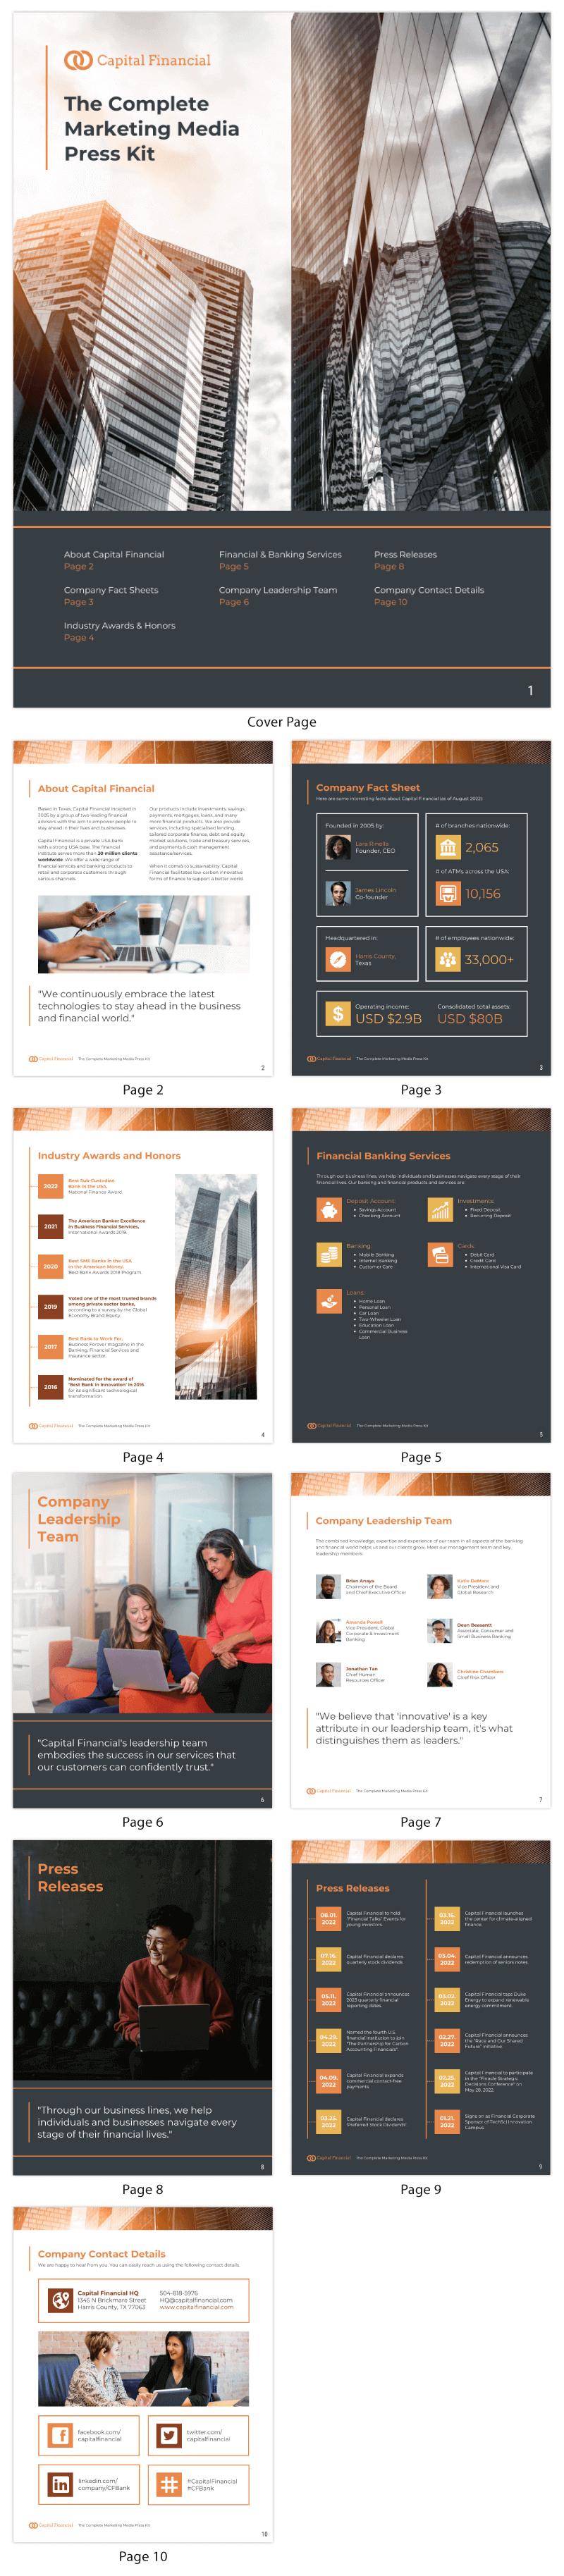 Bank Services Marketing Media Press Kit Template